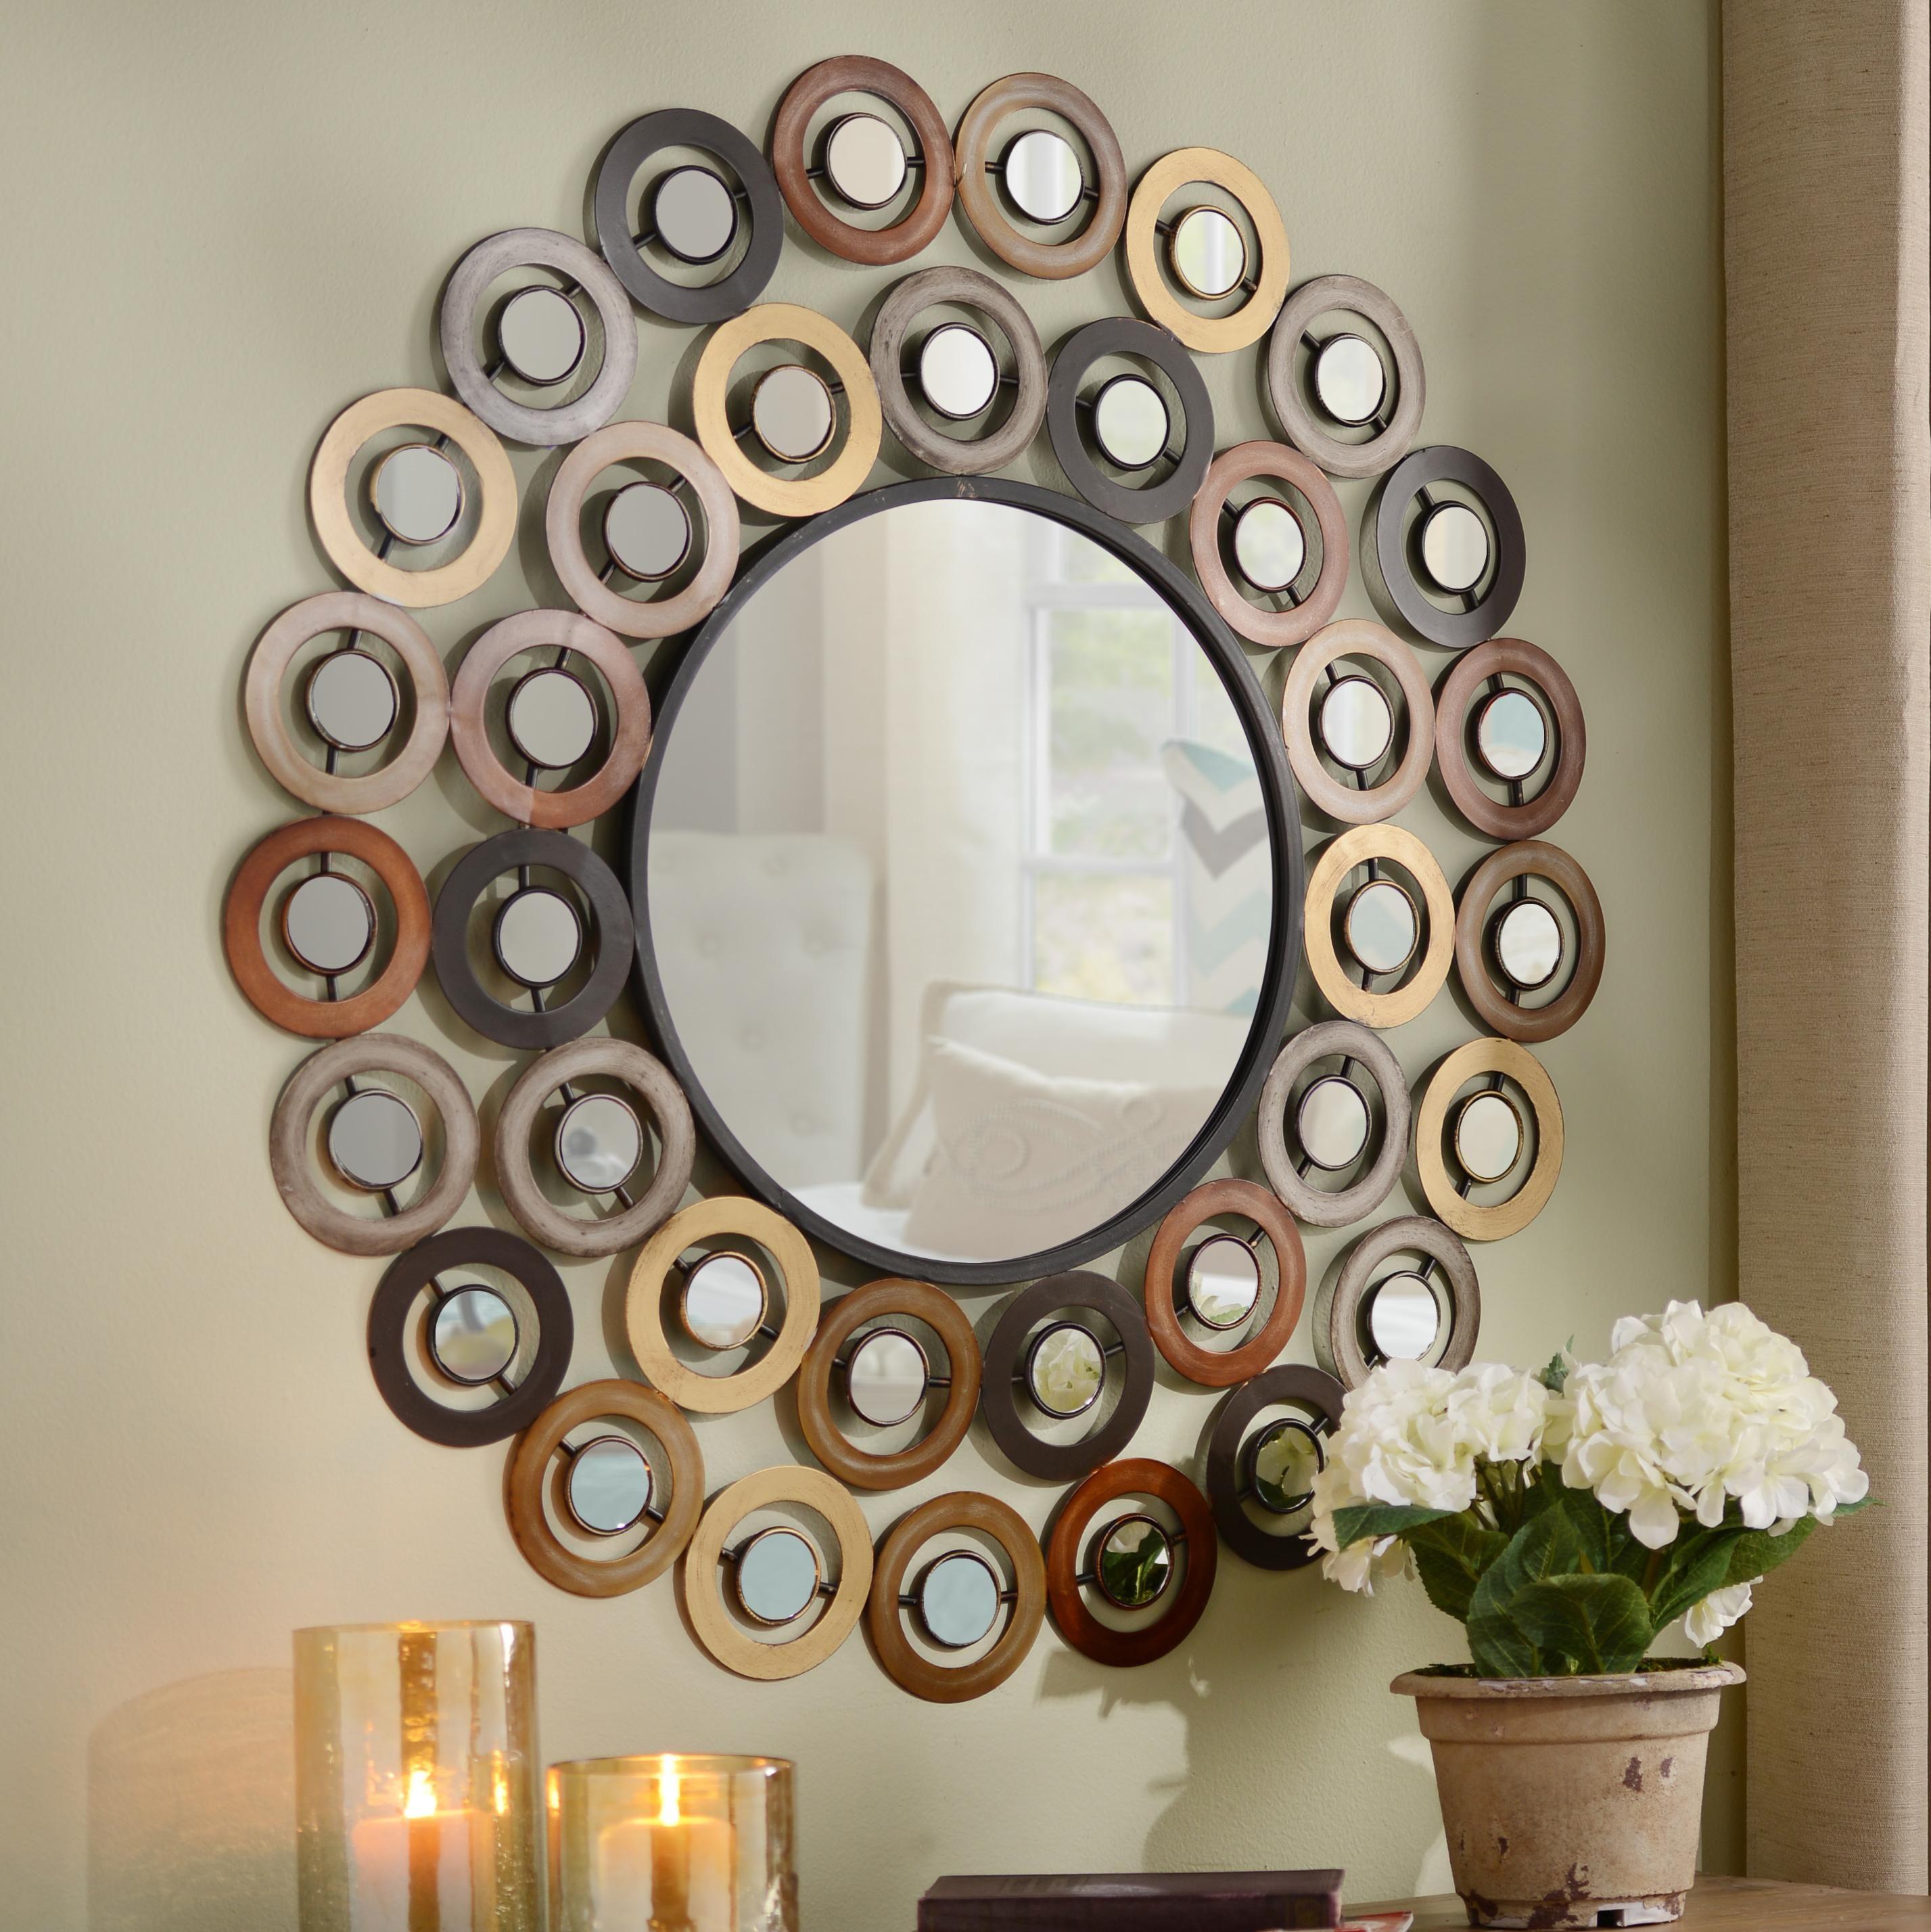 Wire capiz sunburst wall mirror - Metallic Dots Mirror